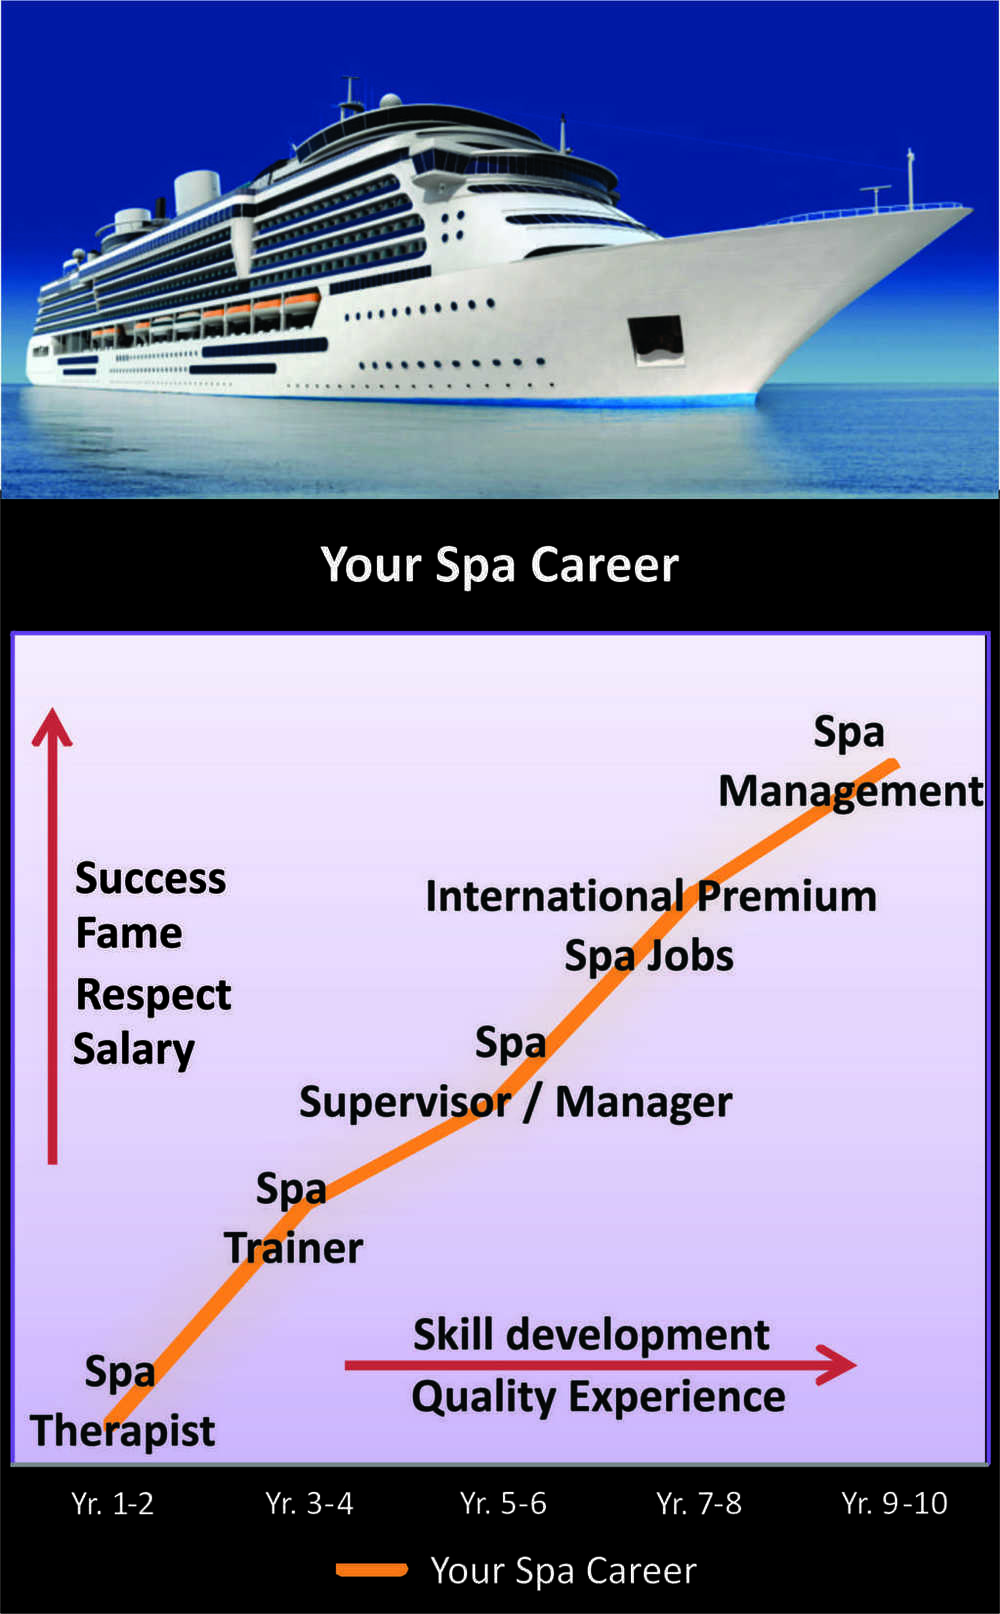 SSS - Your Spa Career (FILEminimizer).jpg